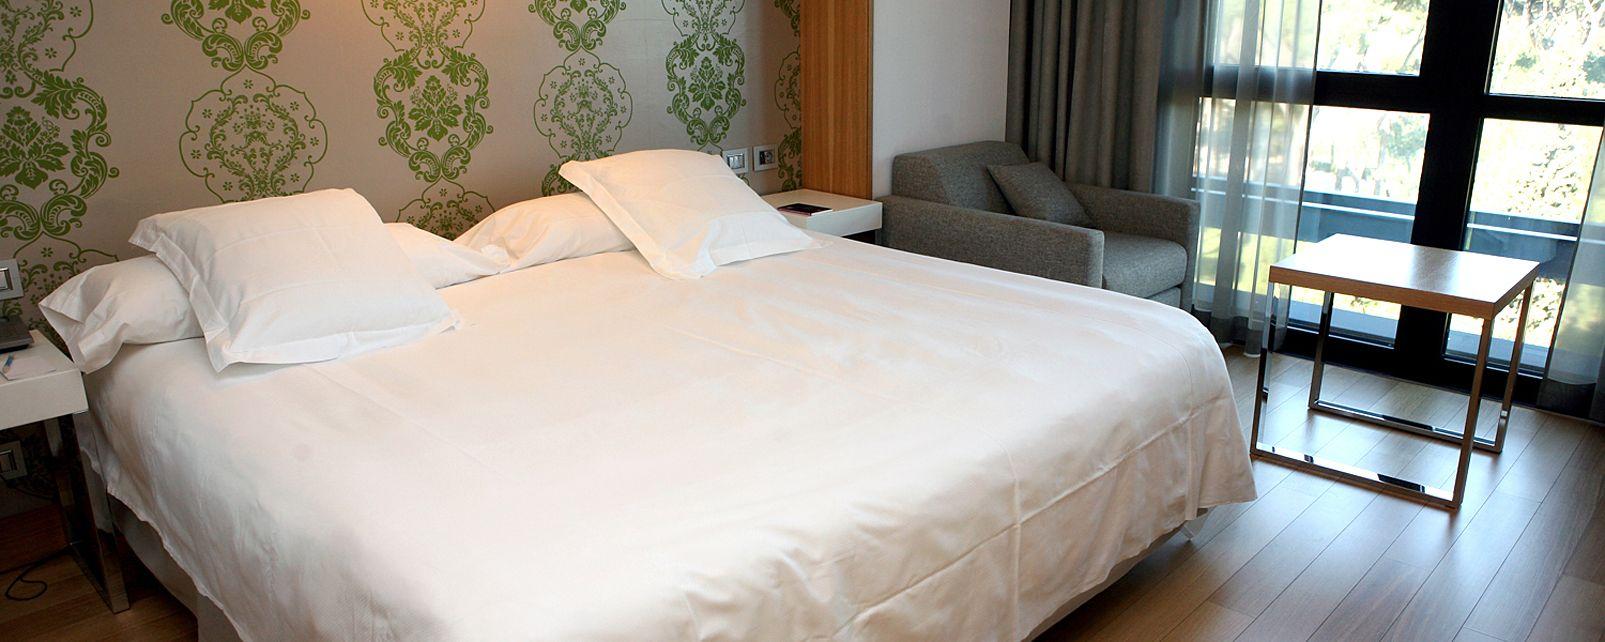 Hotel NH Vittorio Veneto